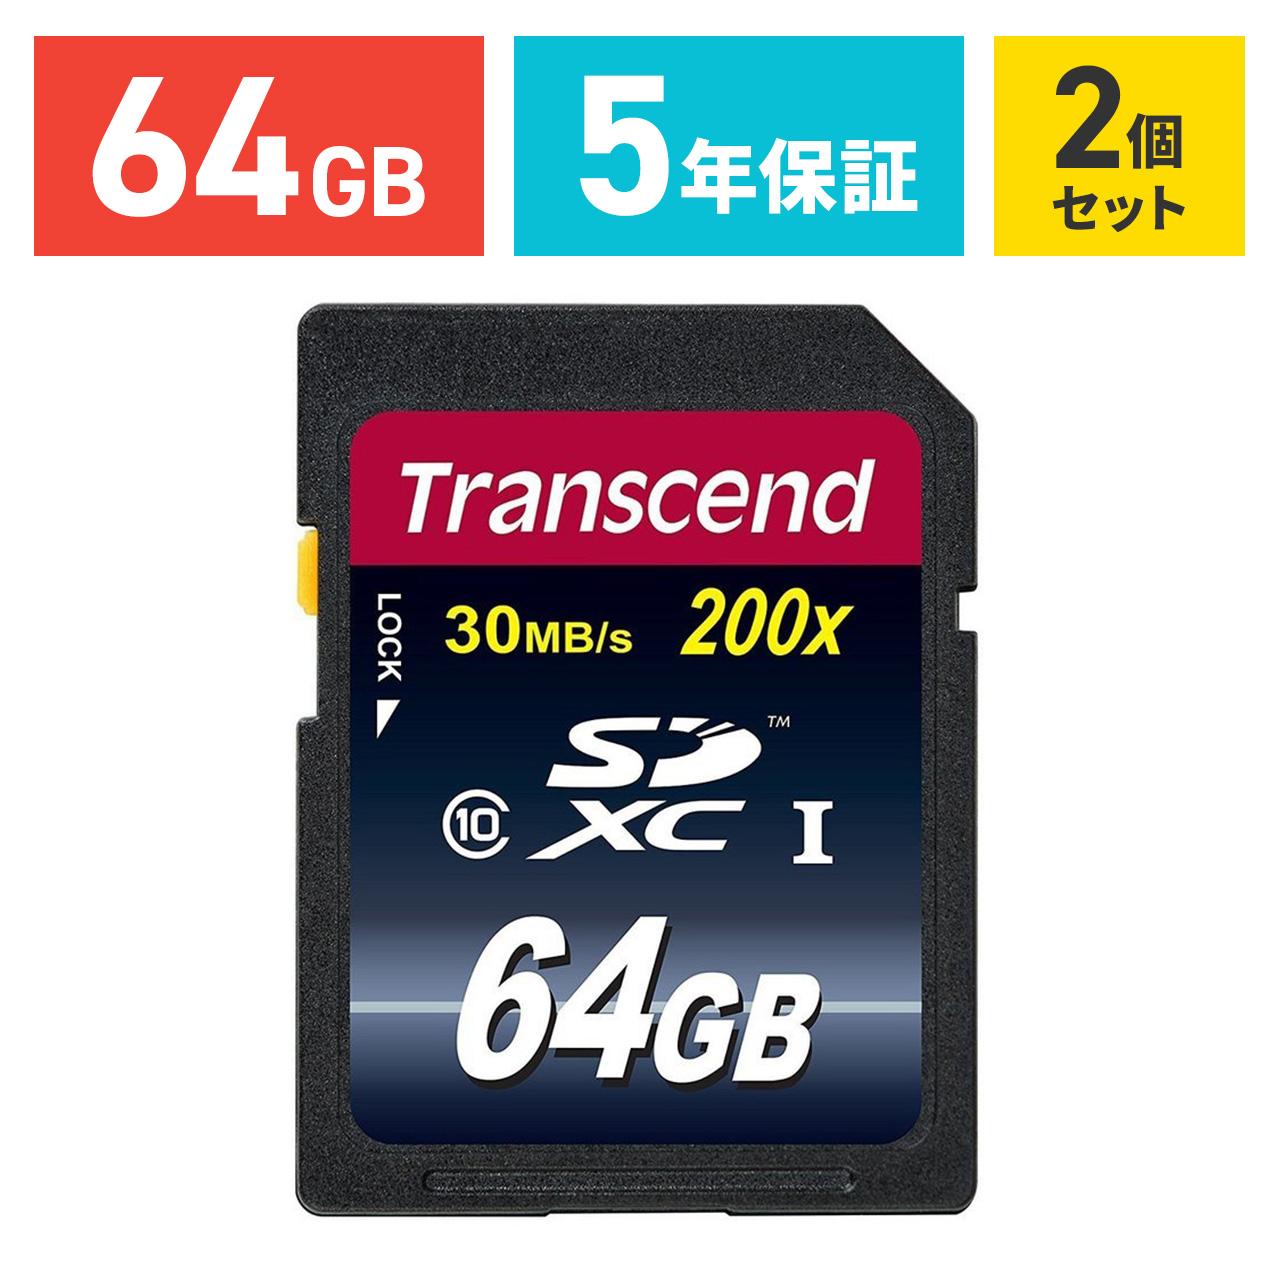 TS64GSDXC10 ネコポス専用 送料無料 まとめ割 1着でも送料無料 2個セット Transcend SDカード 全品最安値に挑戦 64GB Ultimate 卒業 入学 クラス10 SDXC Class10 メモリーカード